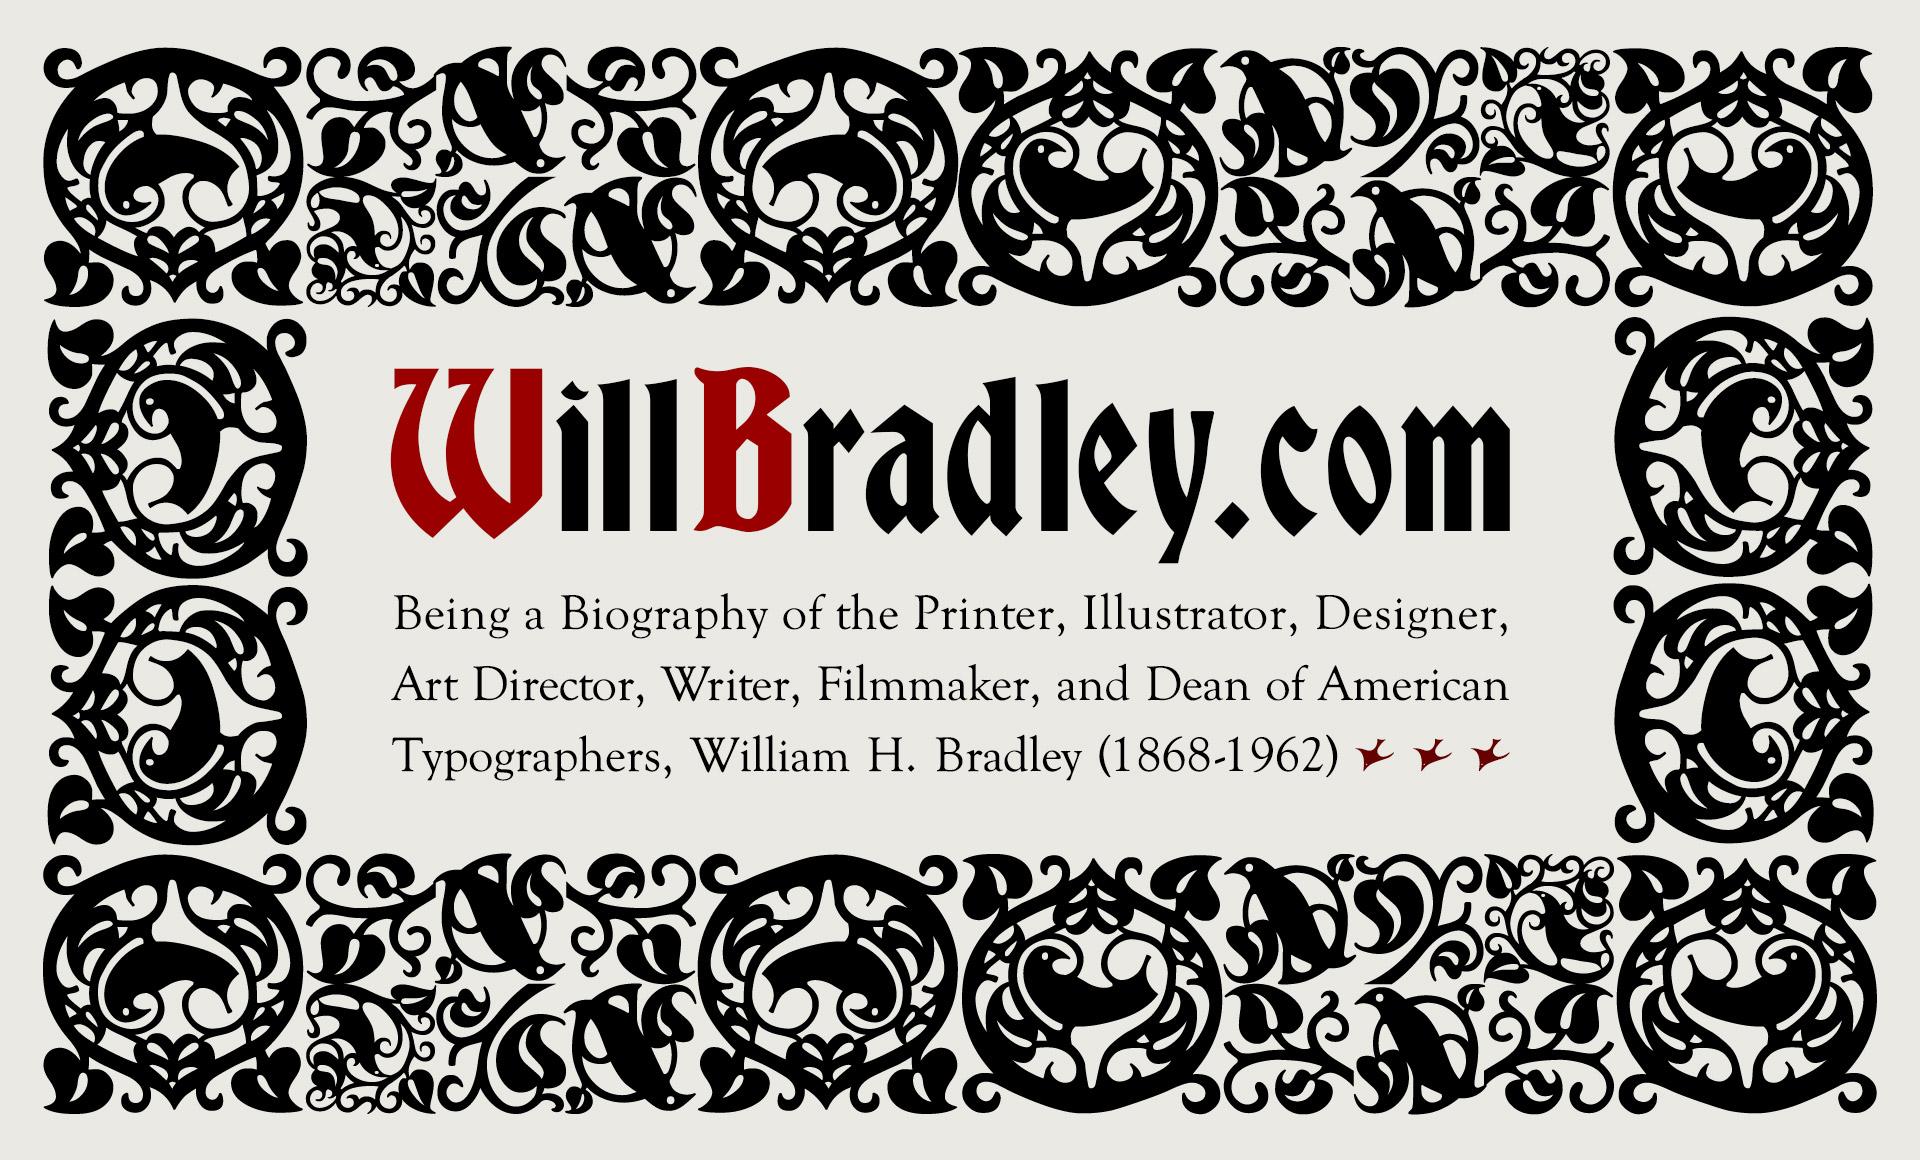 WillBradley.com - Will H. Bradley (1868-1962), Master of American Art Nouveau, illustrator, designer, printer, typographer, film-maker and art director